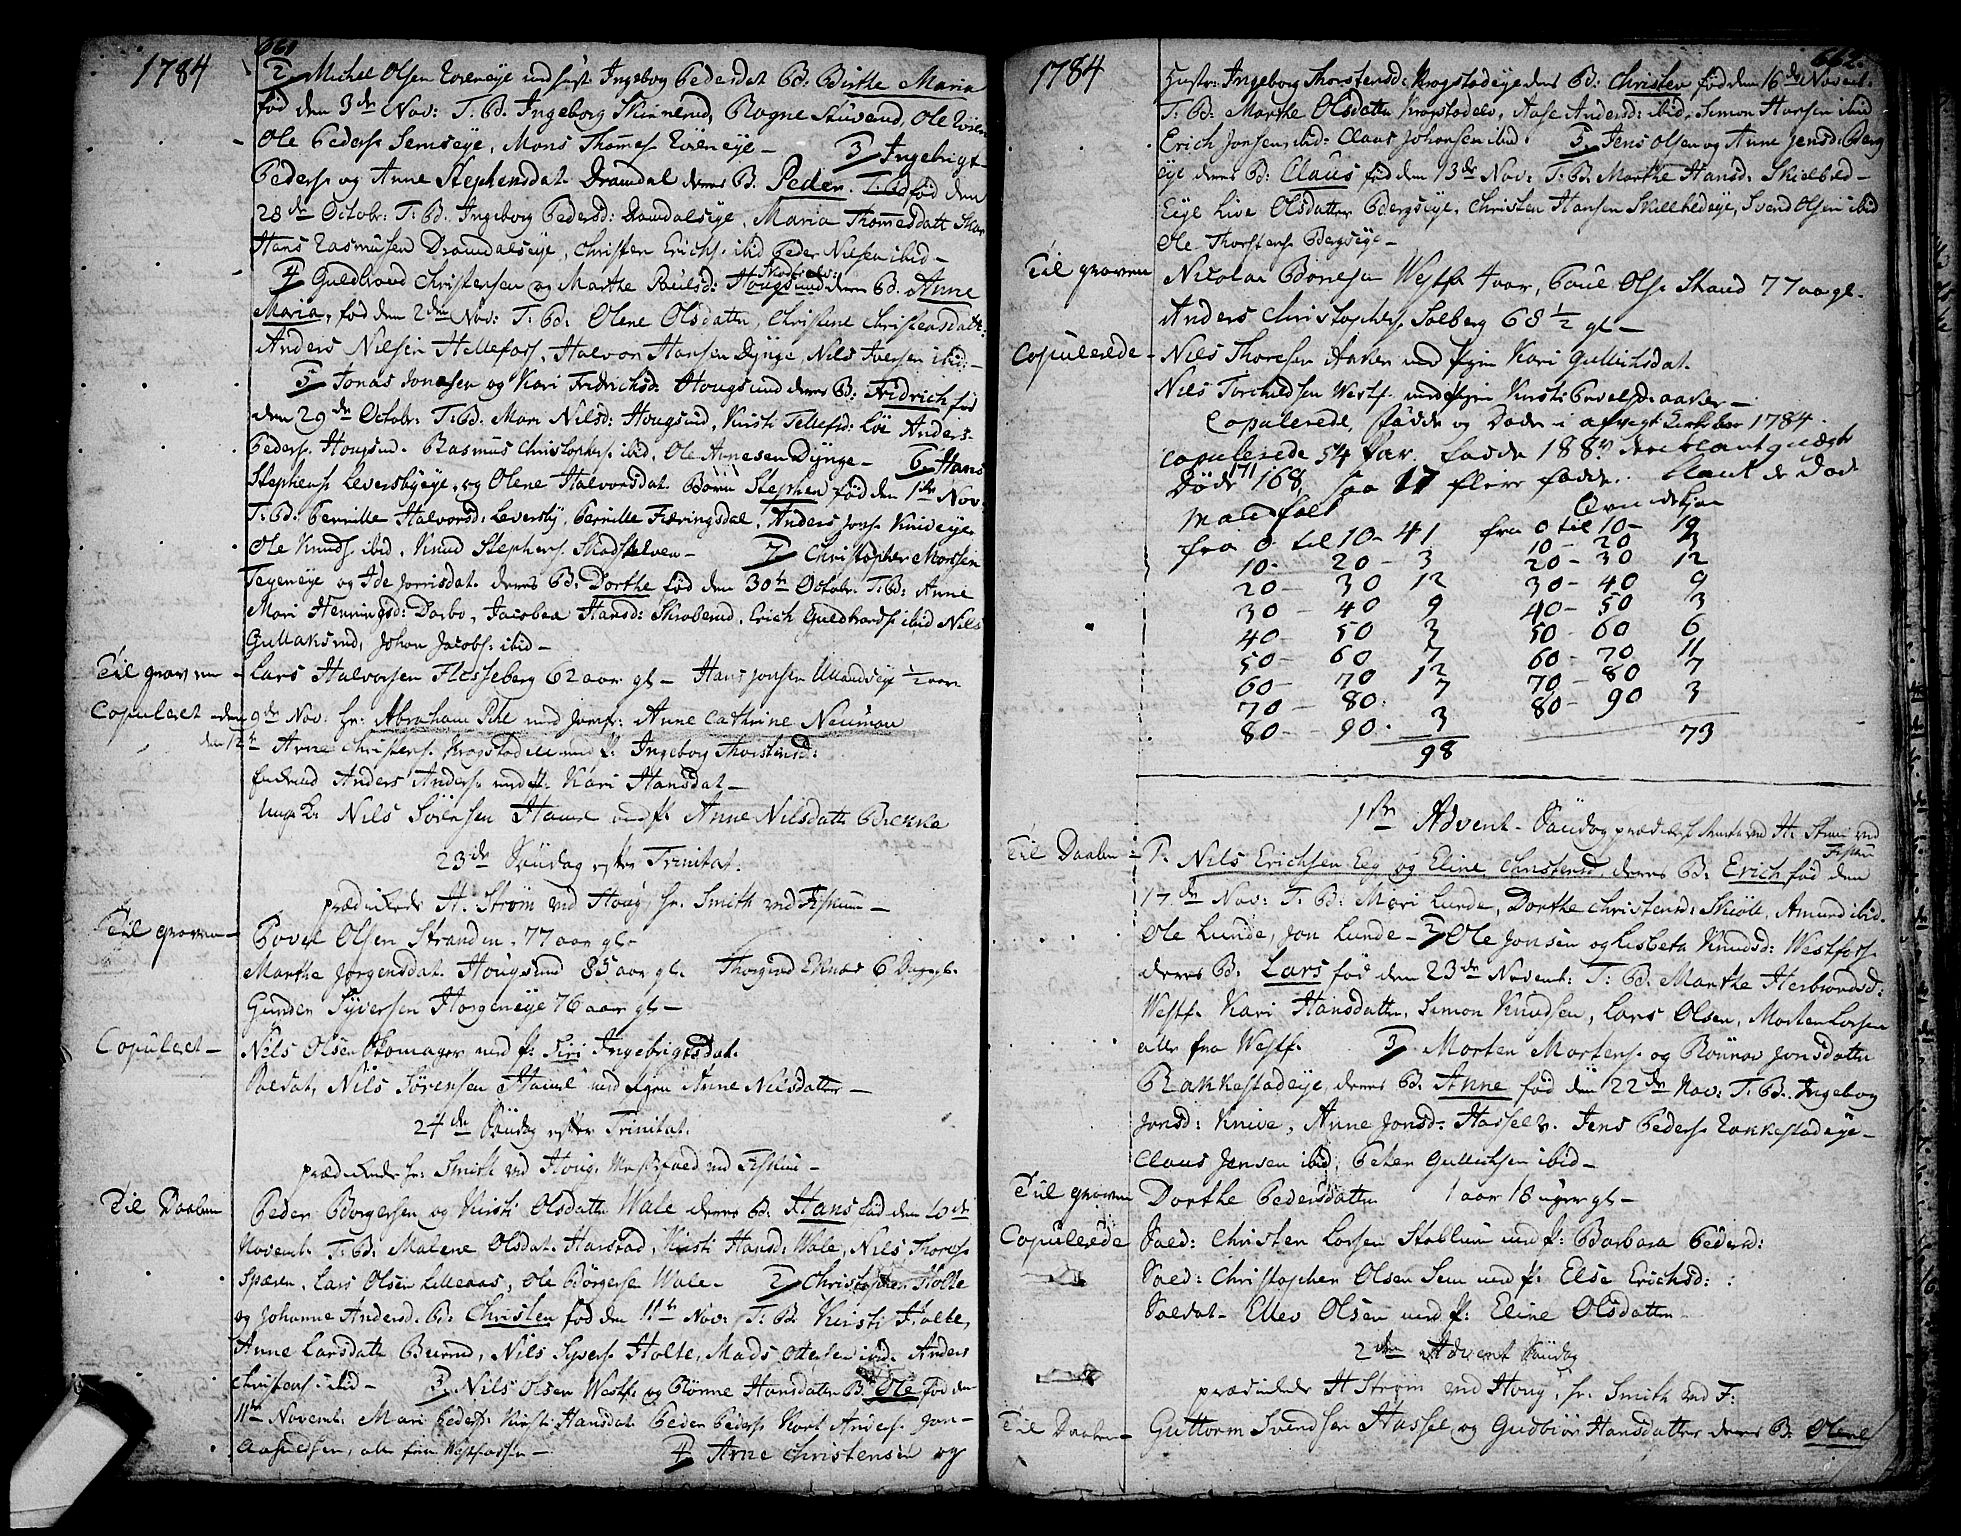 SAKO, Eiker kirkebøker, F/Fa/L0008: Ministerialbok nr. I 8, 1764-1788, s. 661-662